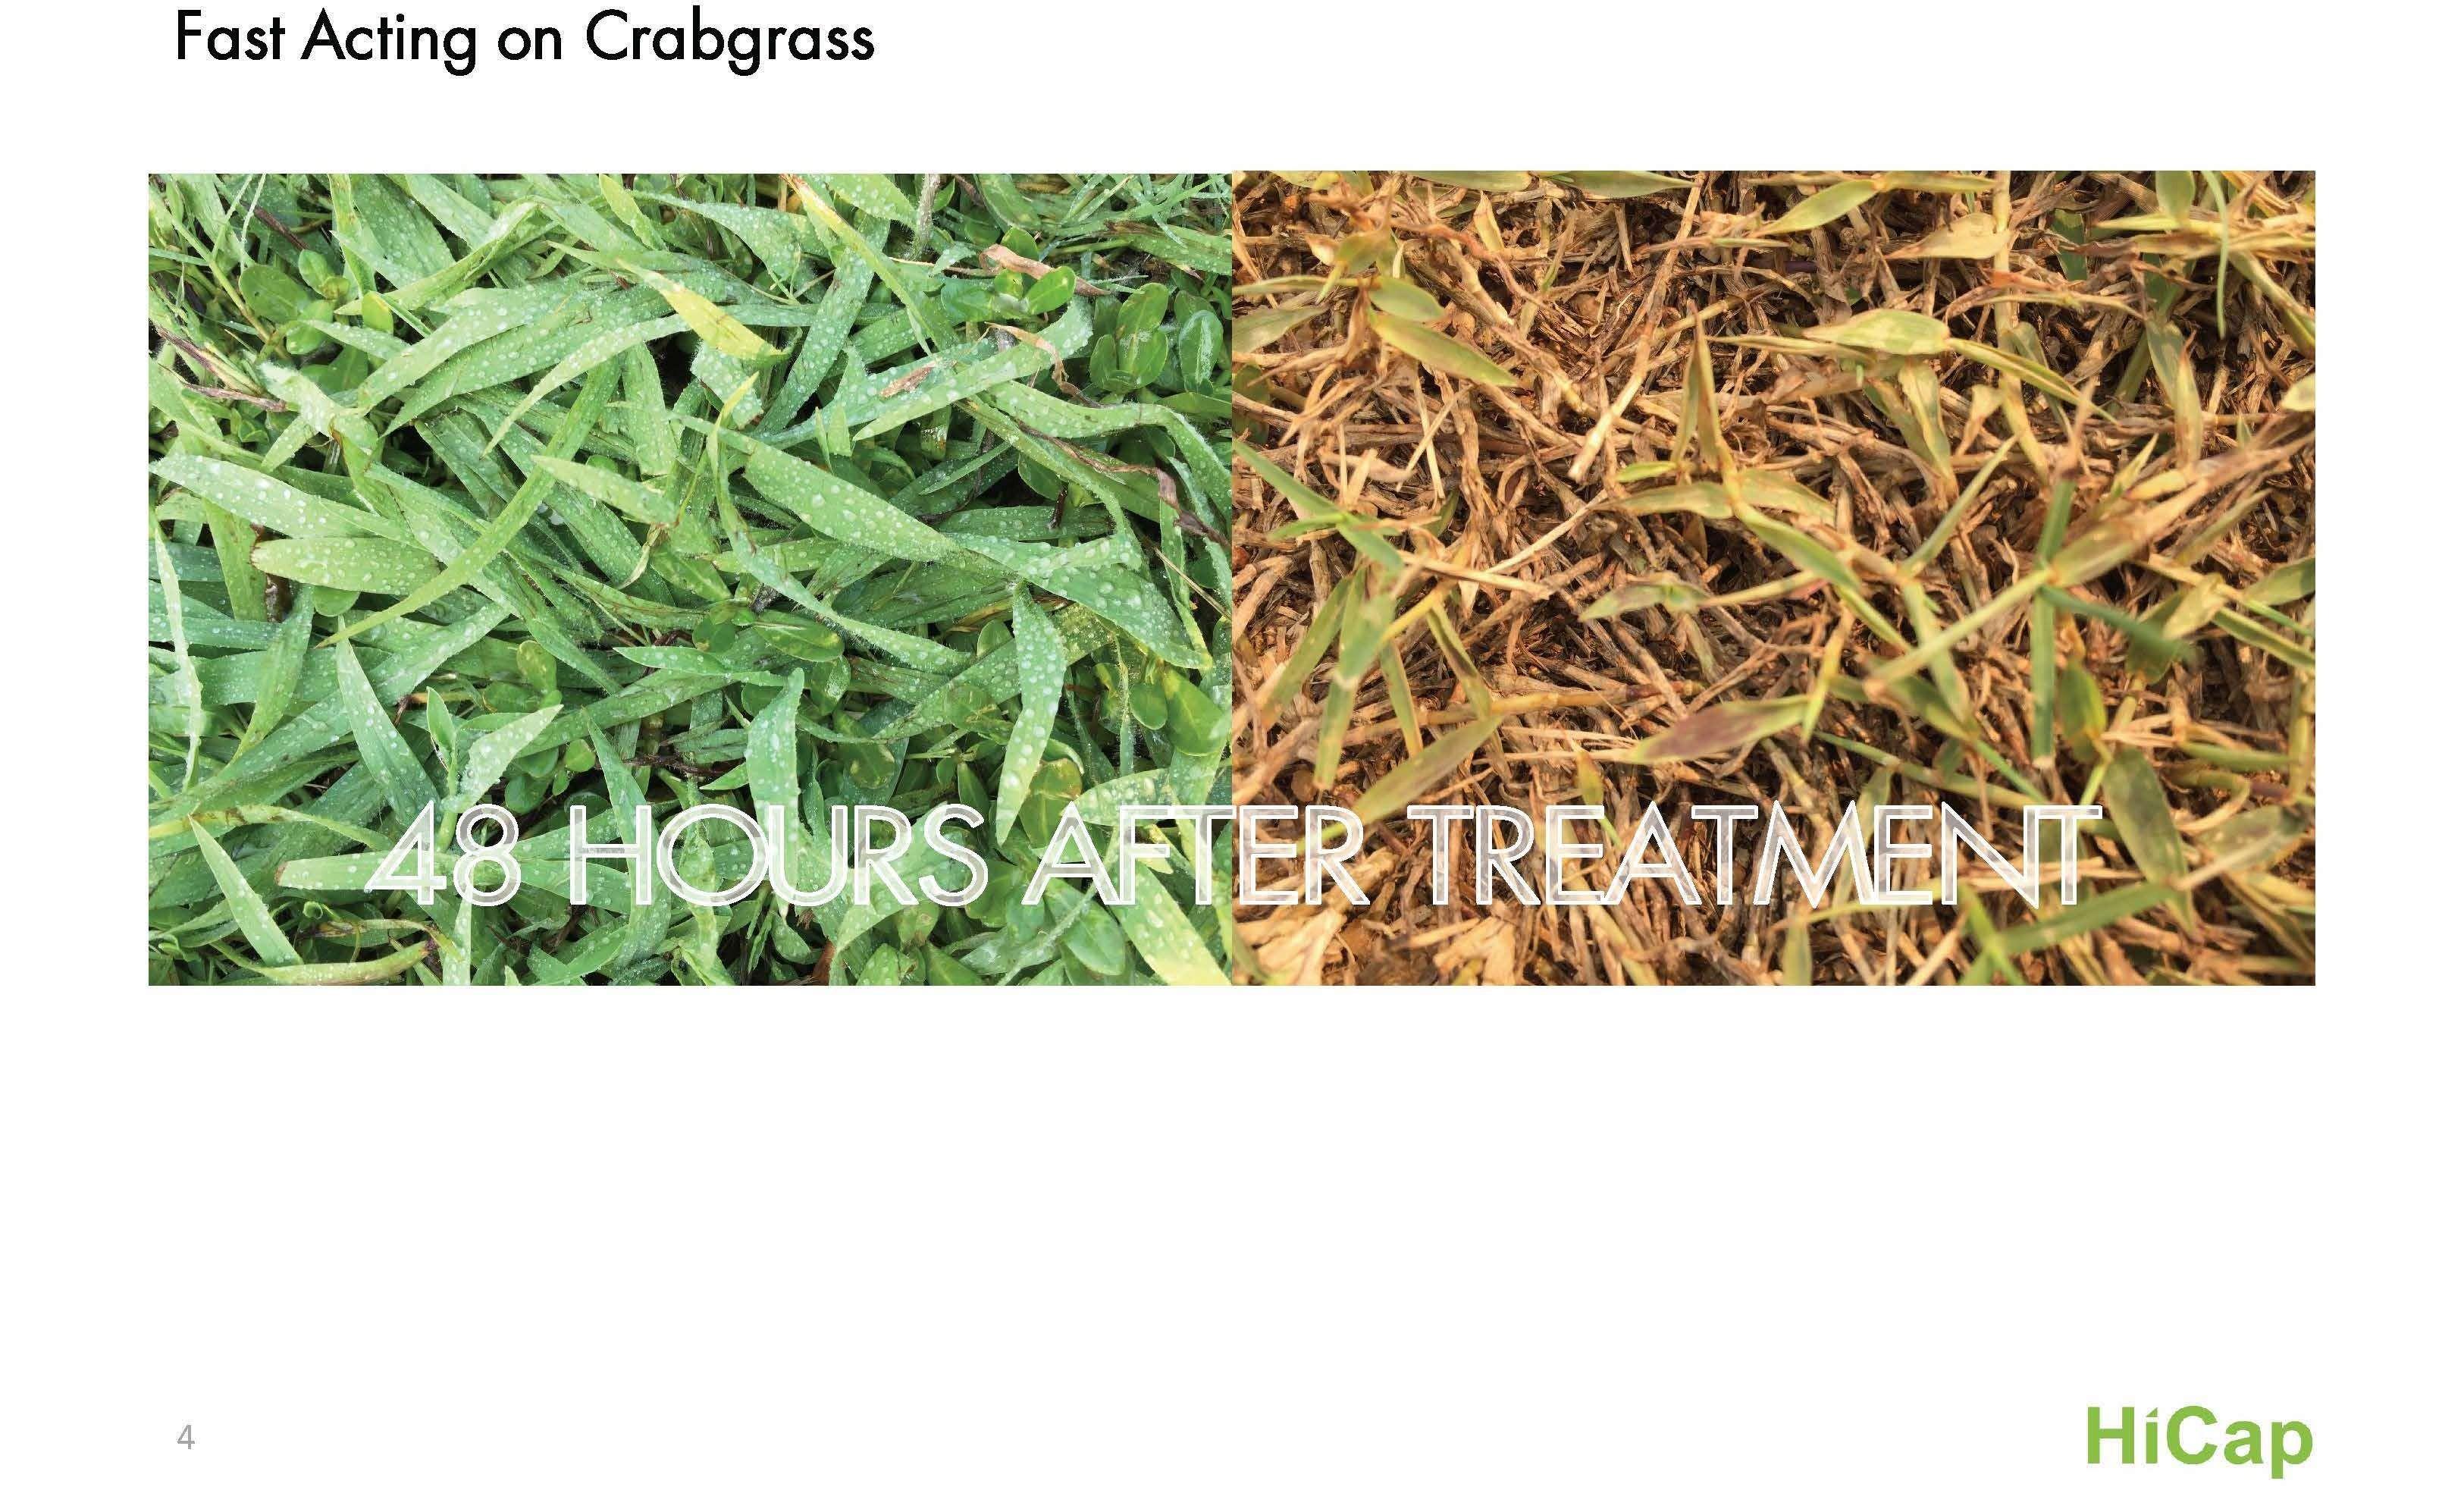 Raute (Post-emergent crabgrass control herbicide)